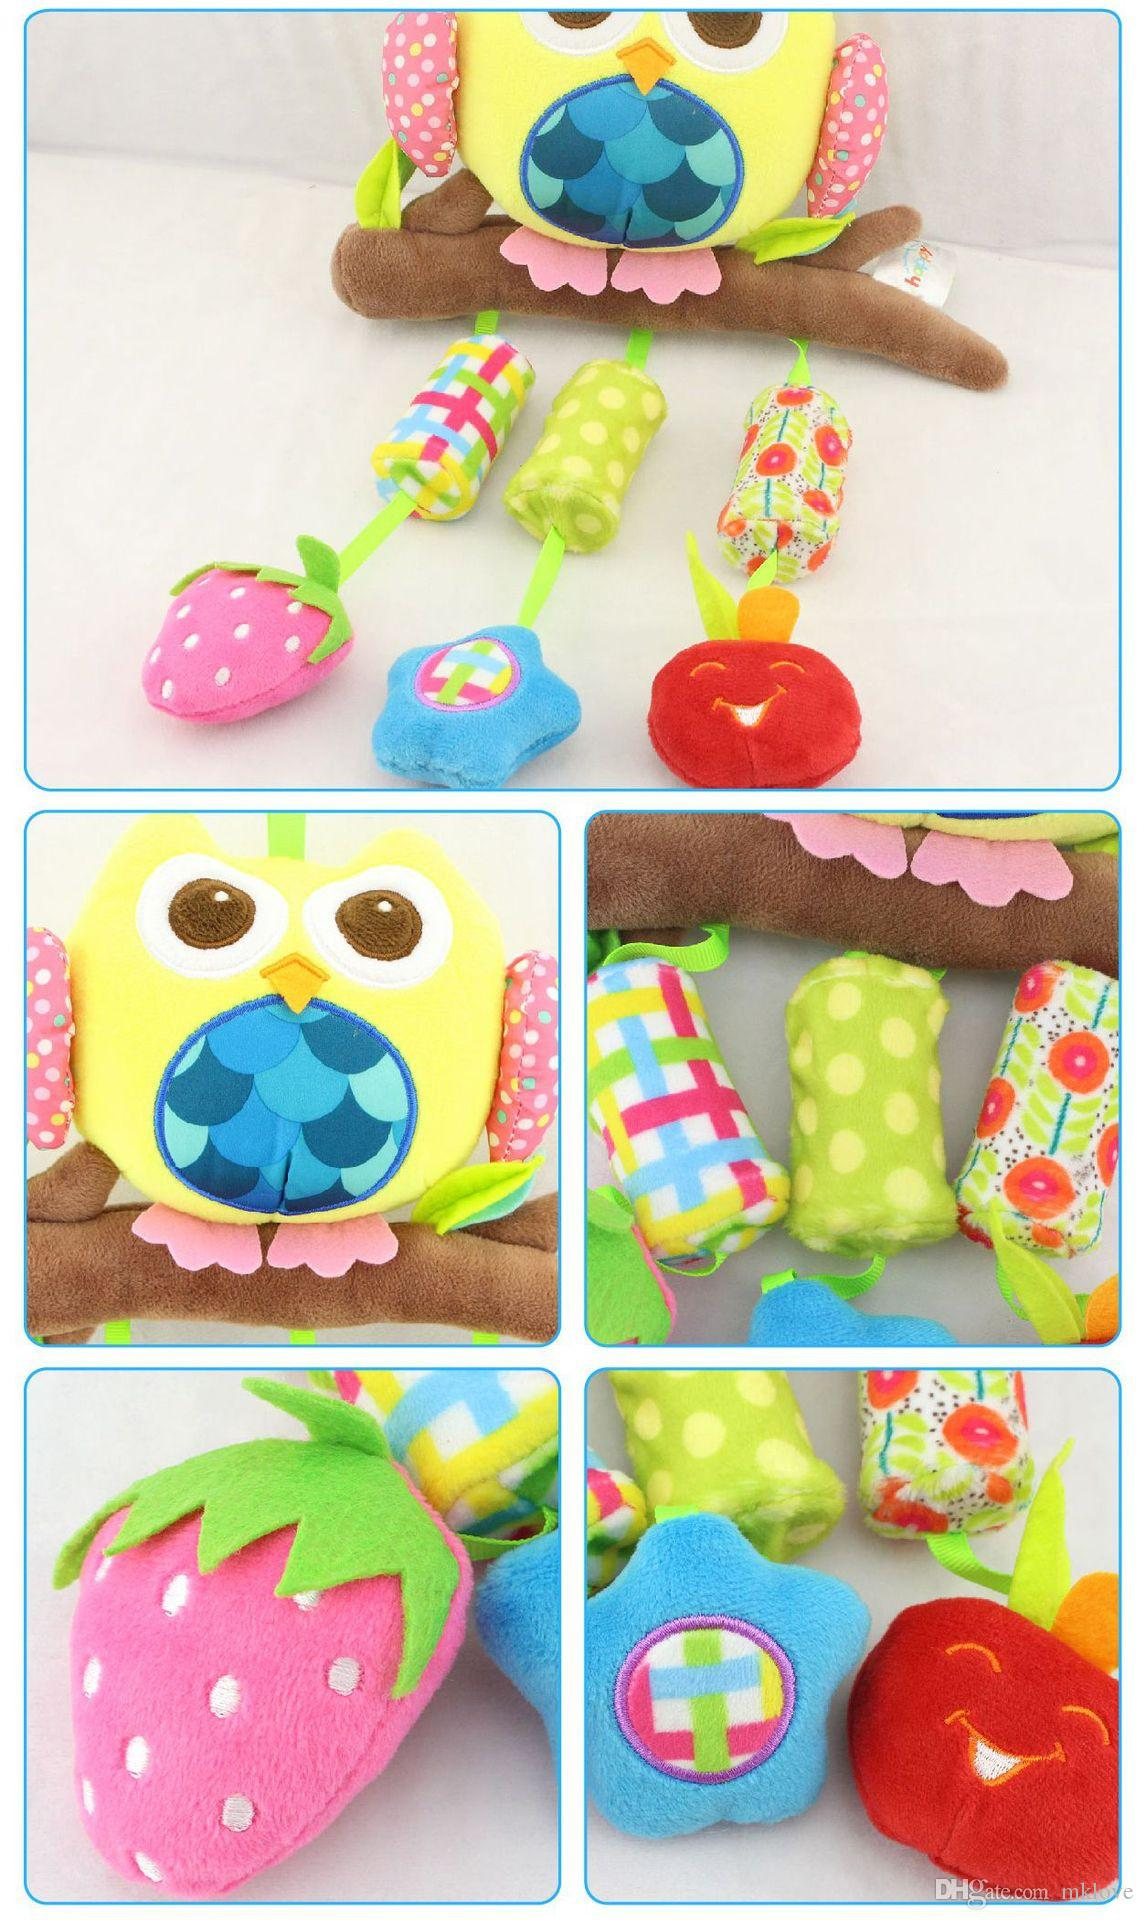 Nuevo bebé 40 cm felpa búho torno reloj de pared cuna de juguete 3 Wind Chime búho elefante pescado felpa juguete